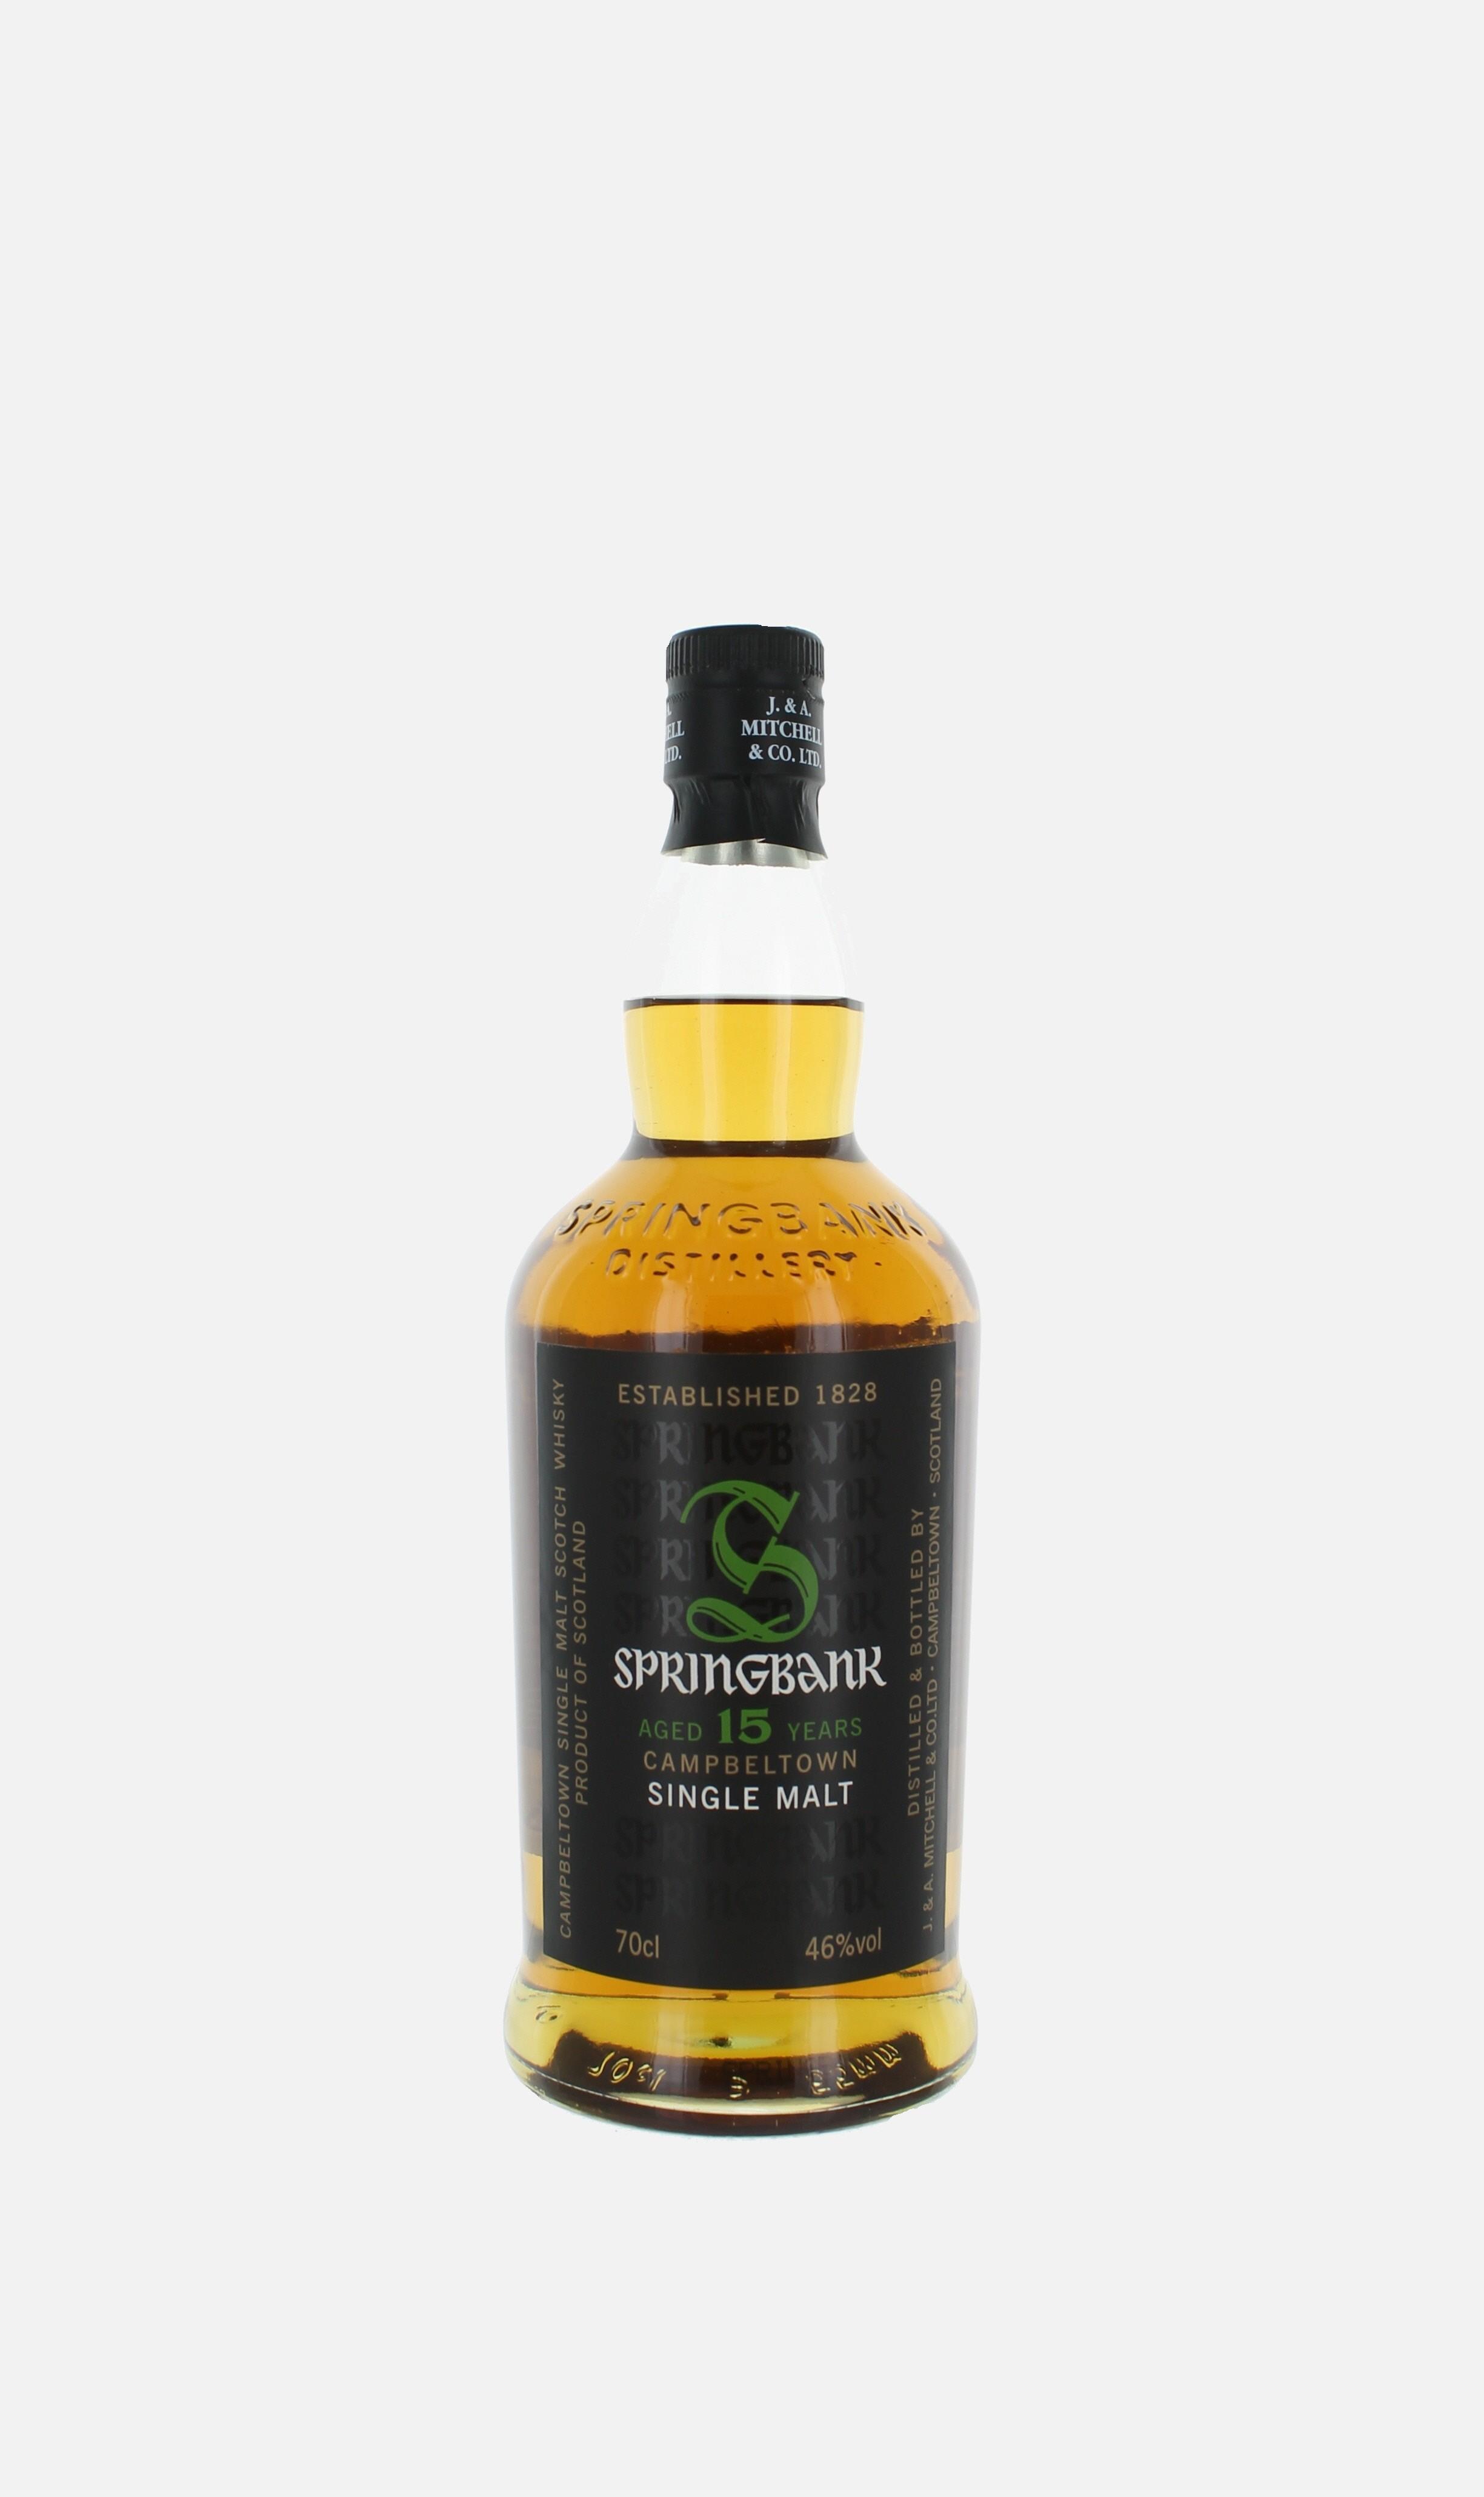 Springbank 10 Years, Campbeltown, Single Malt